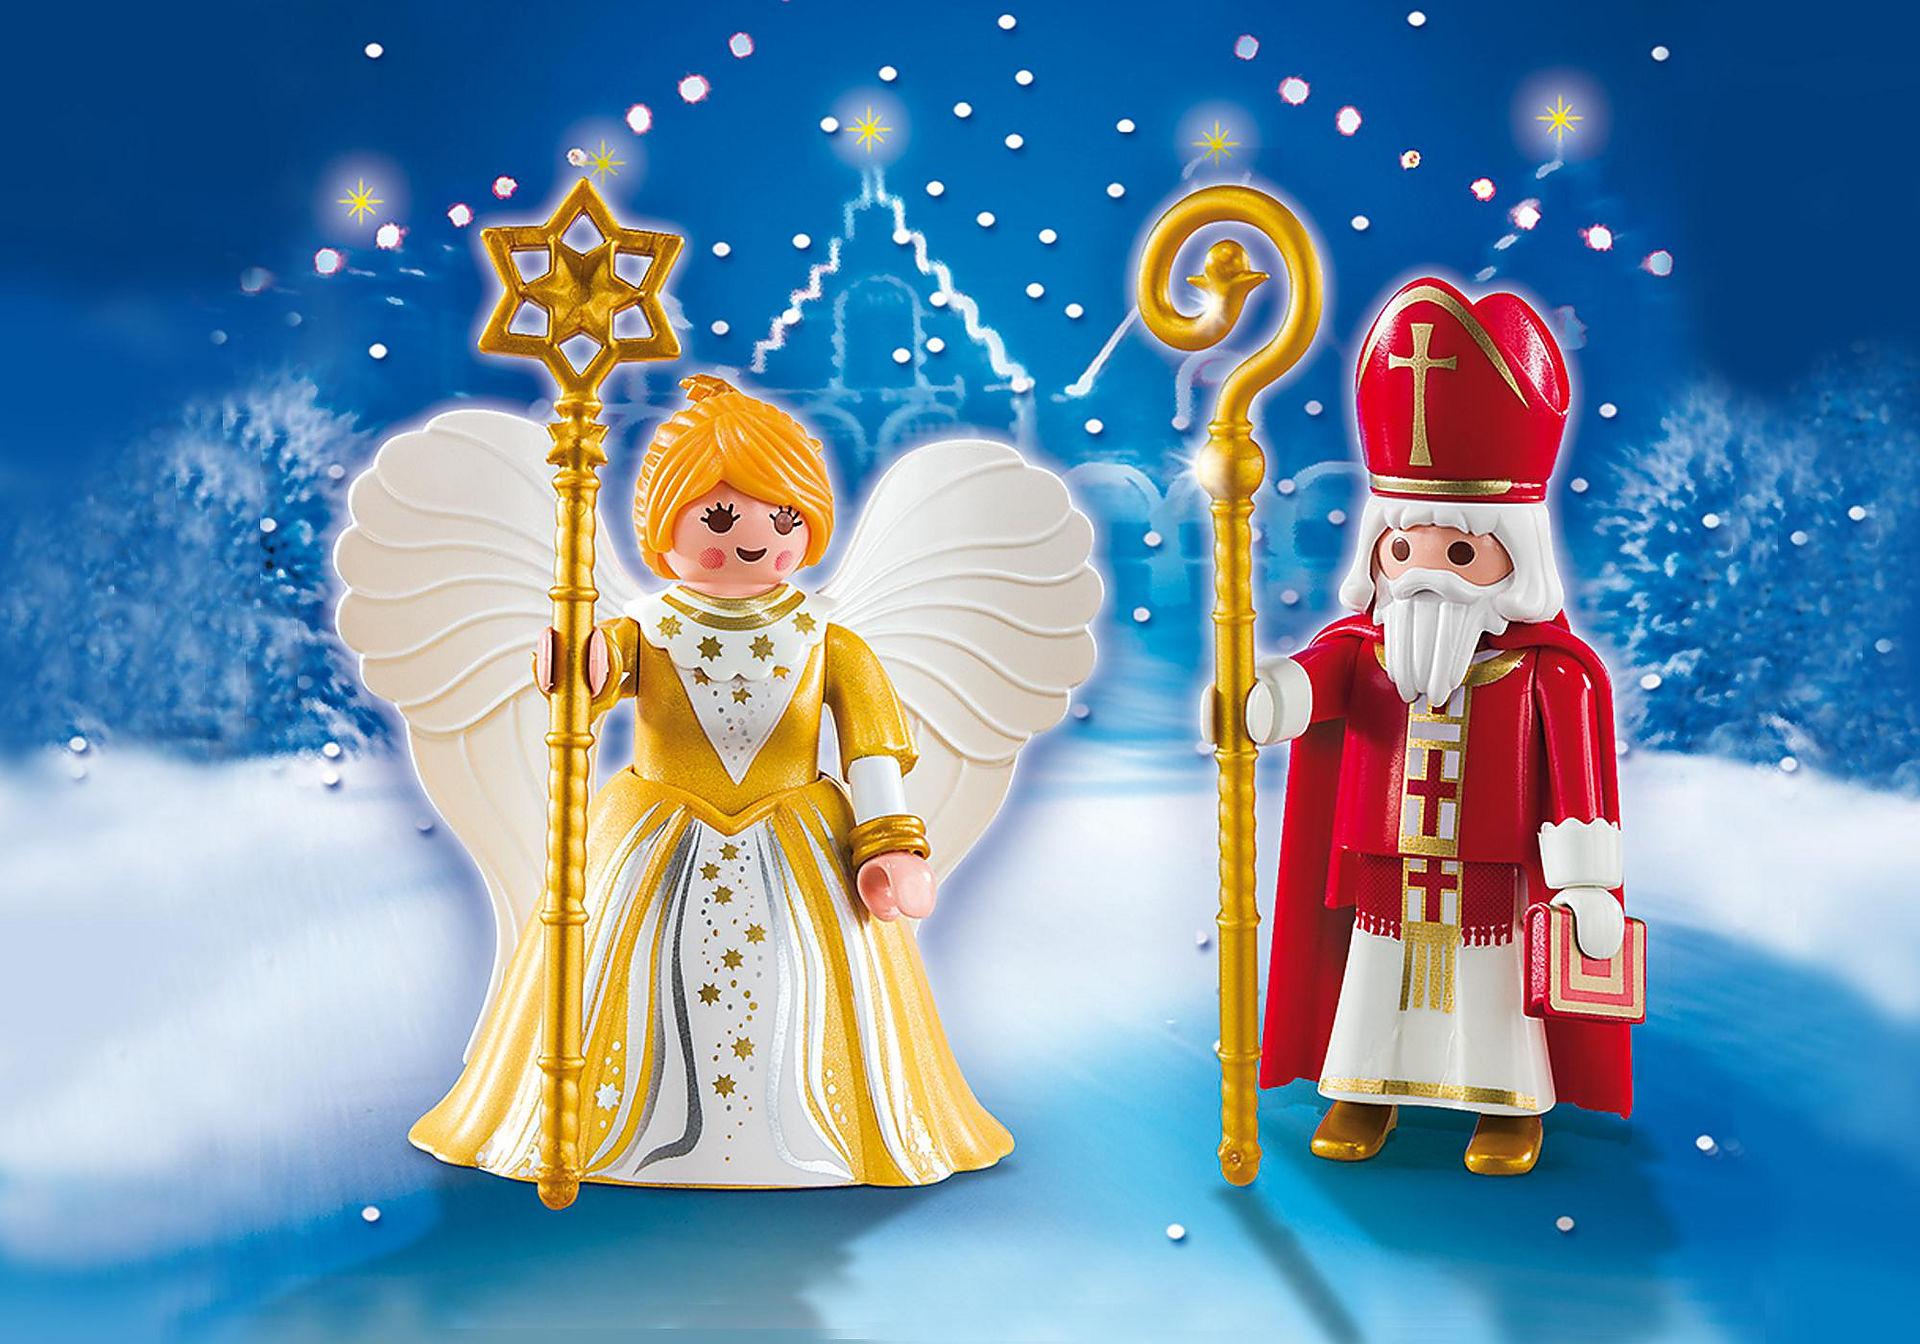 5592 San Nicola e Angelo di Natale zoom image1